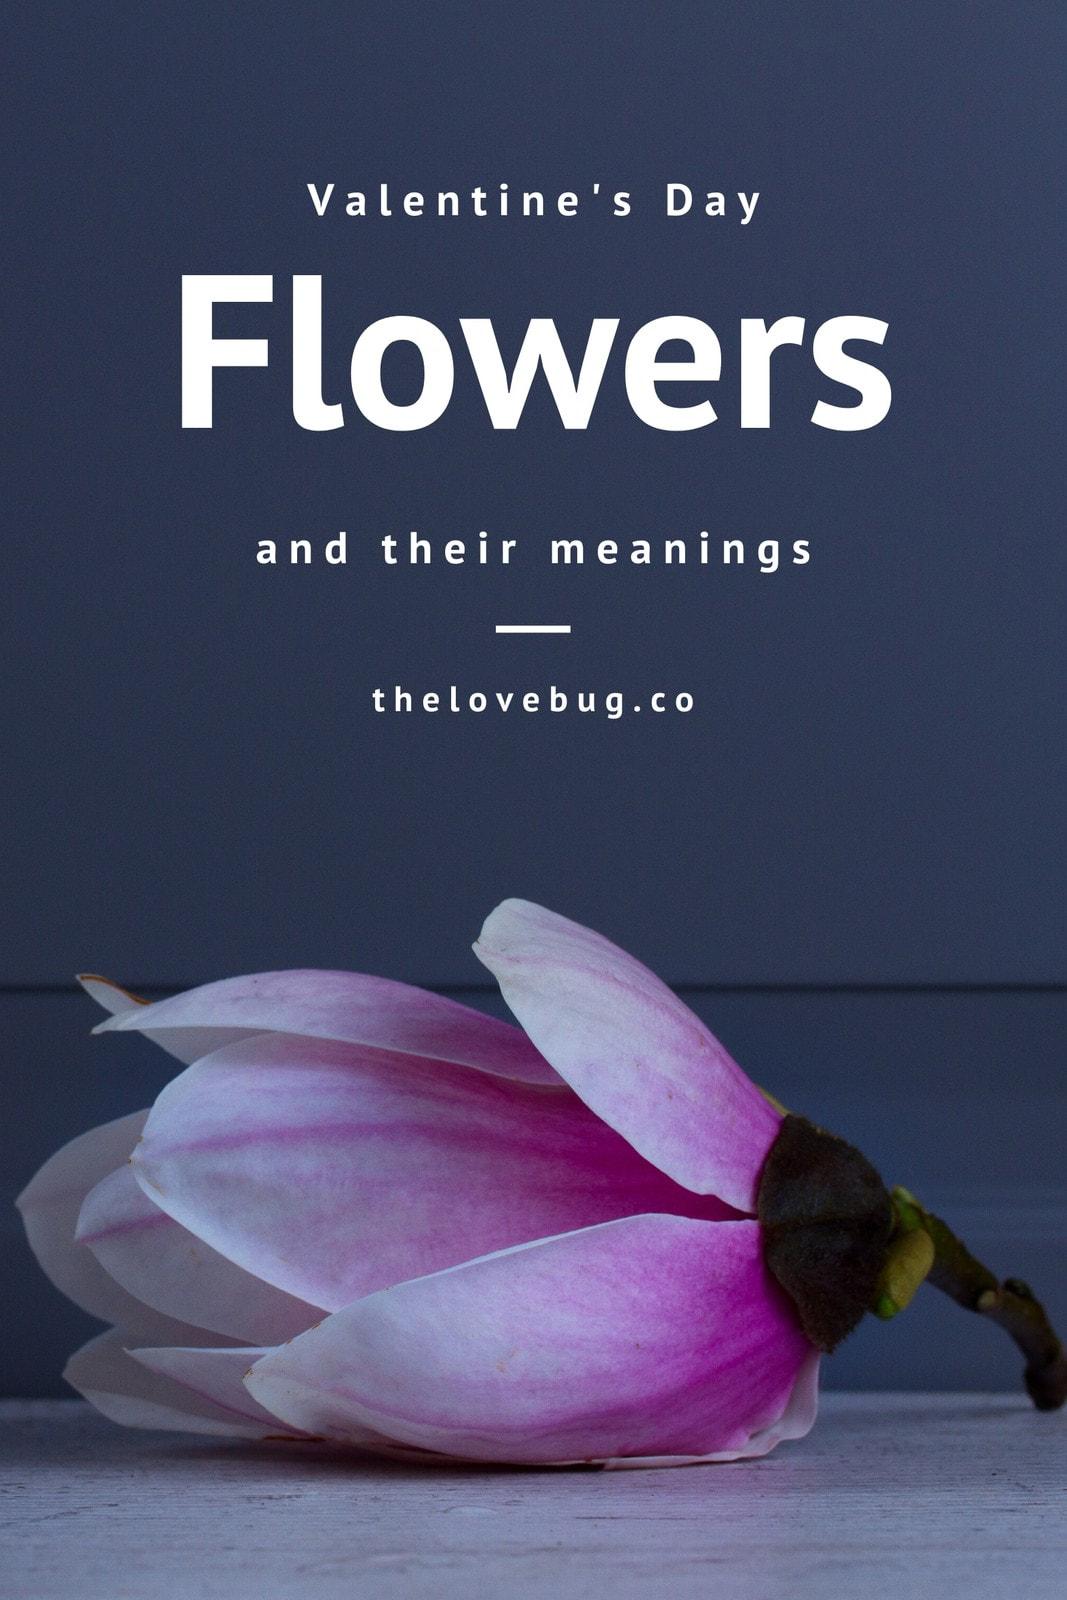 Valentine's Day Flowers Blog Graphic